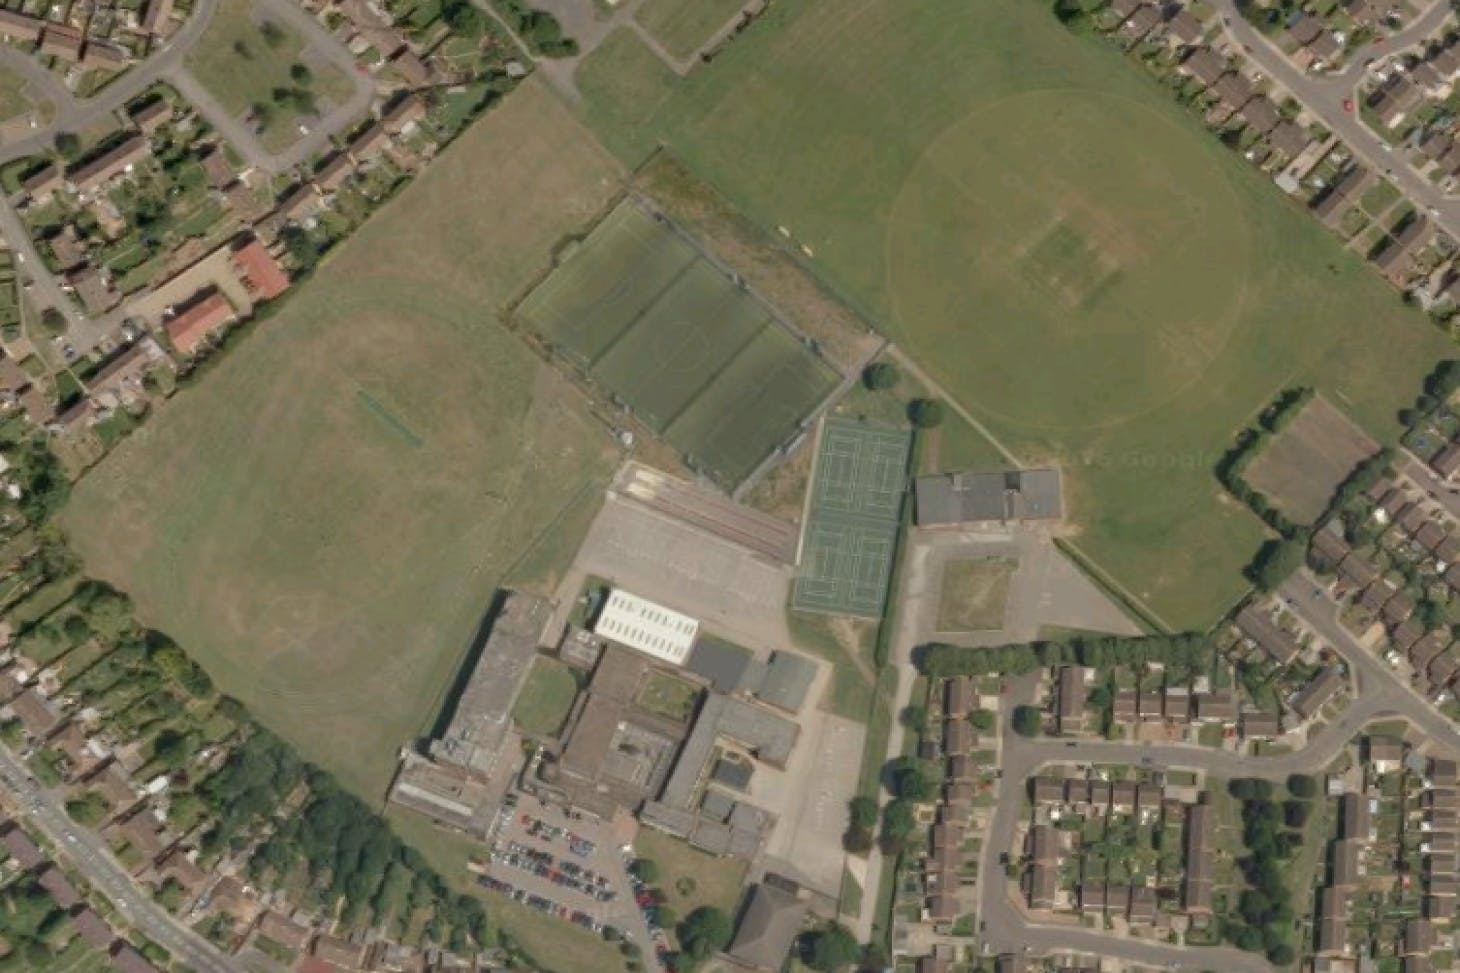 Ashcroft High School 11 a side | Grass football pitch